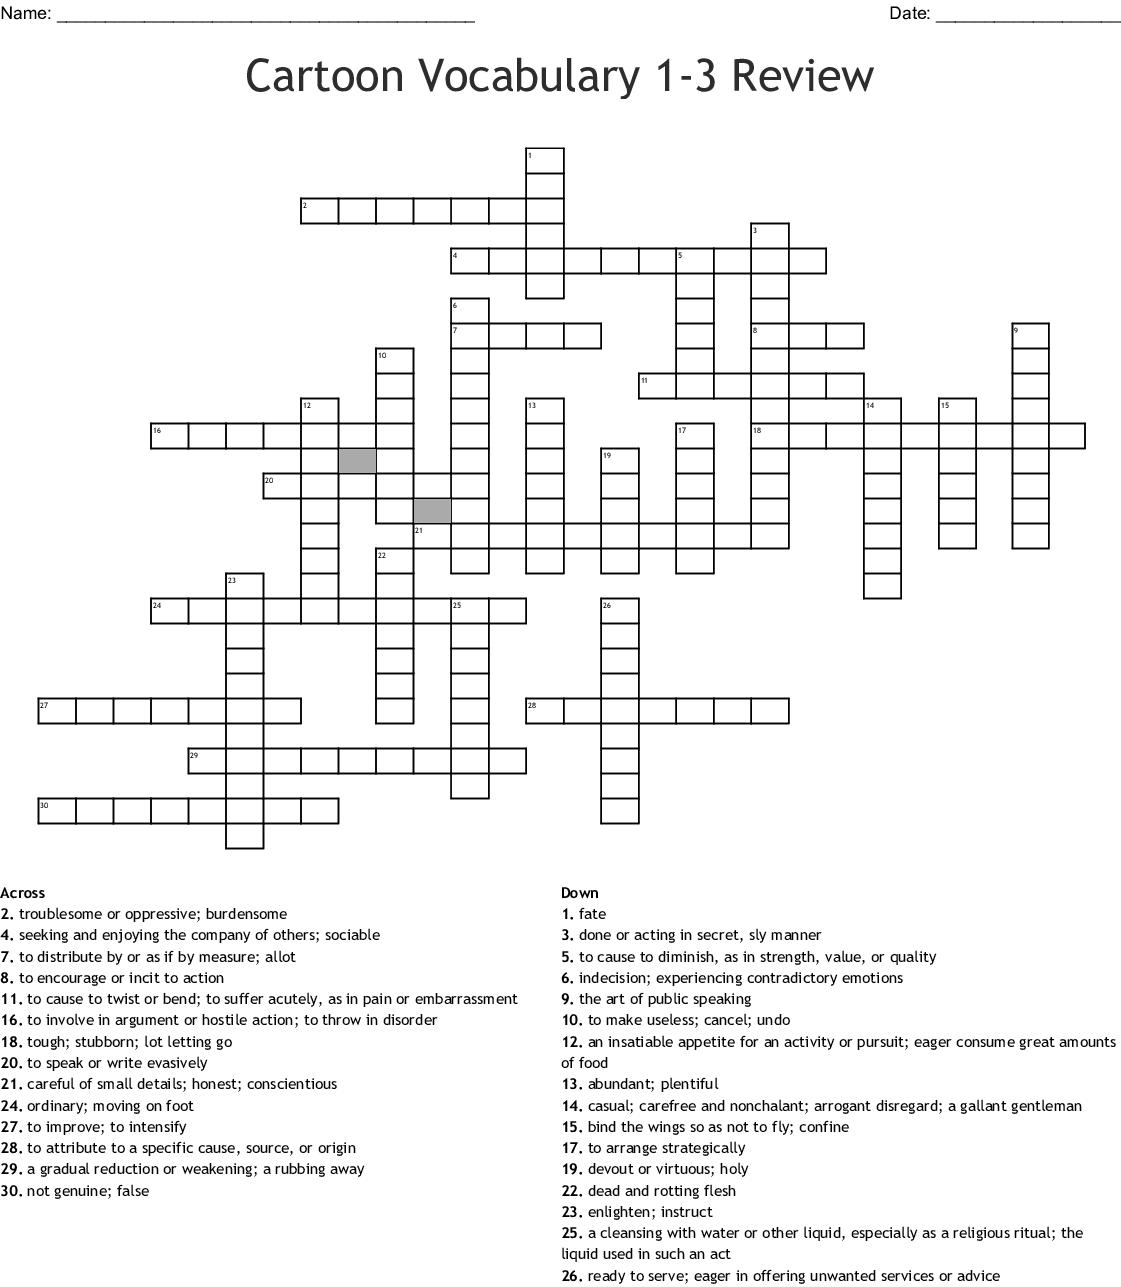 Cartoon Explosion Word Crossword